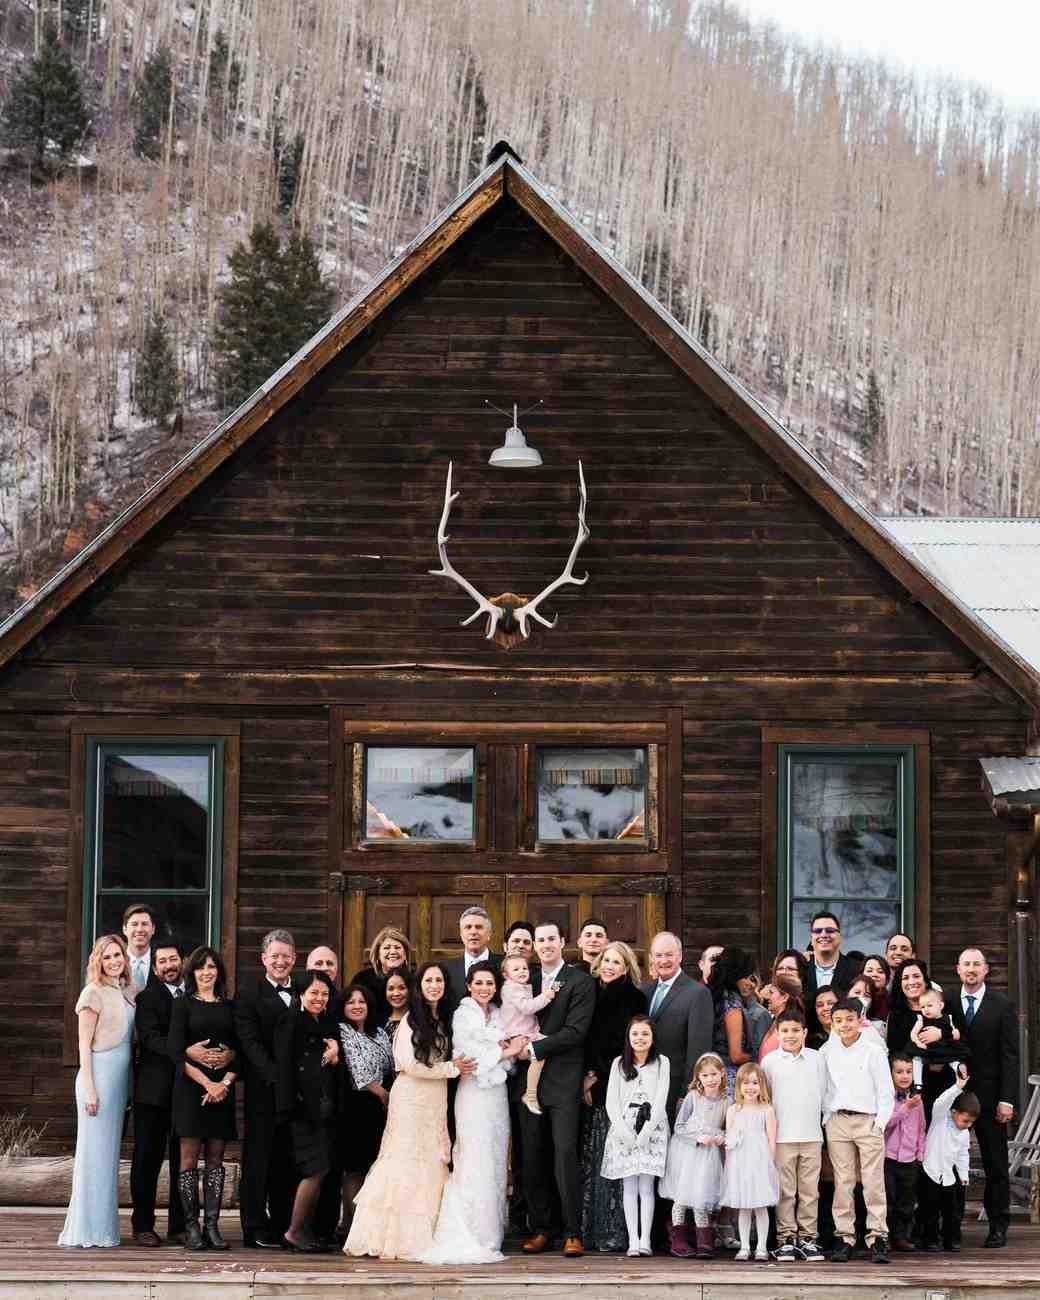 meshach-warren-wedding-groupphoto-0671-6134942-0716.jpg